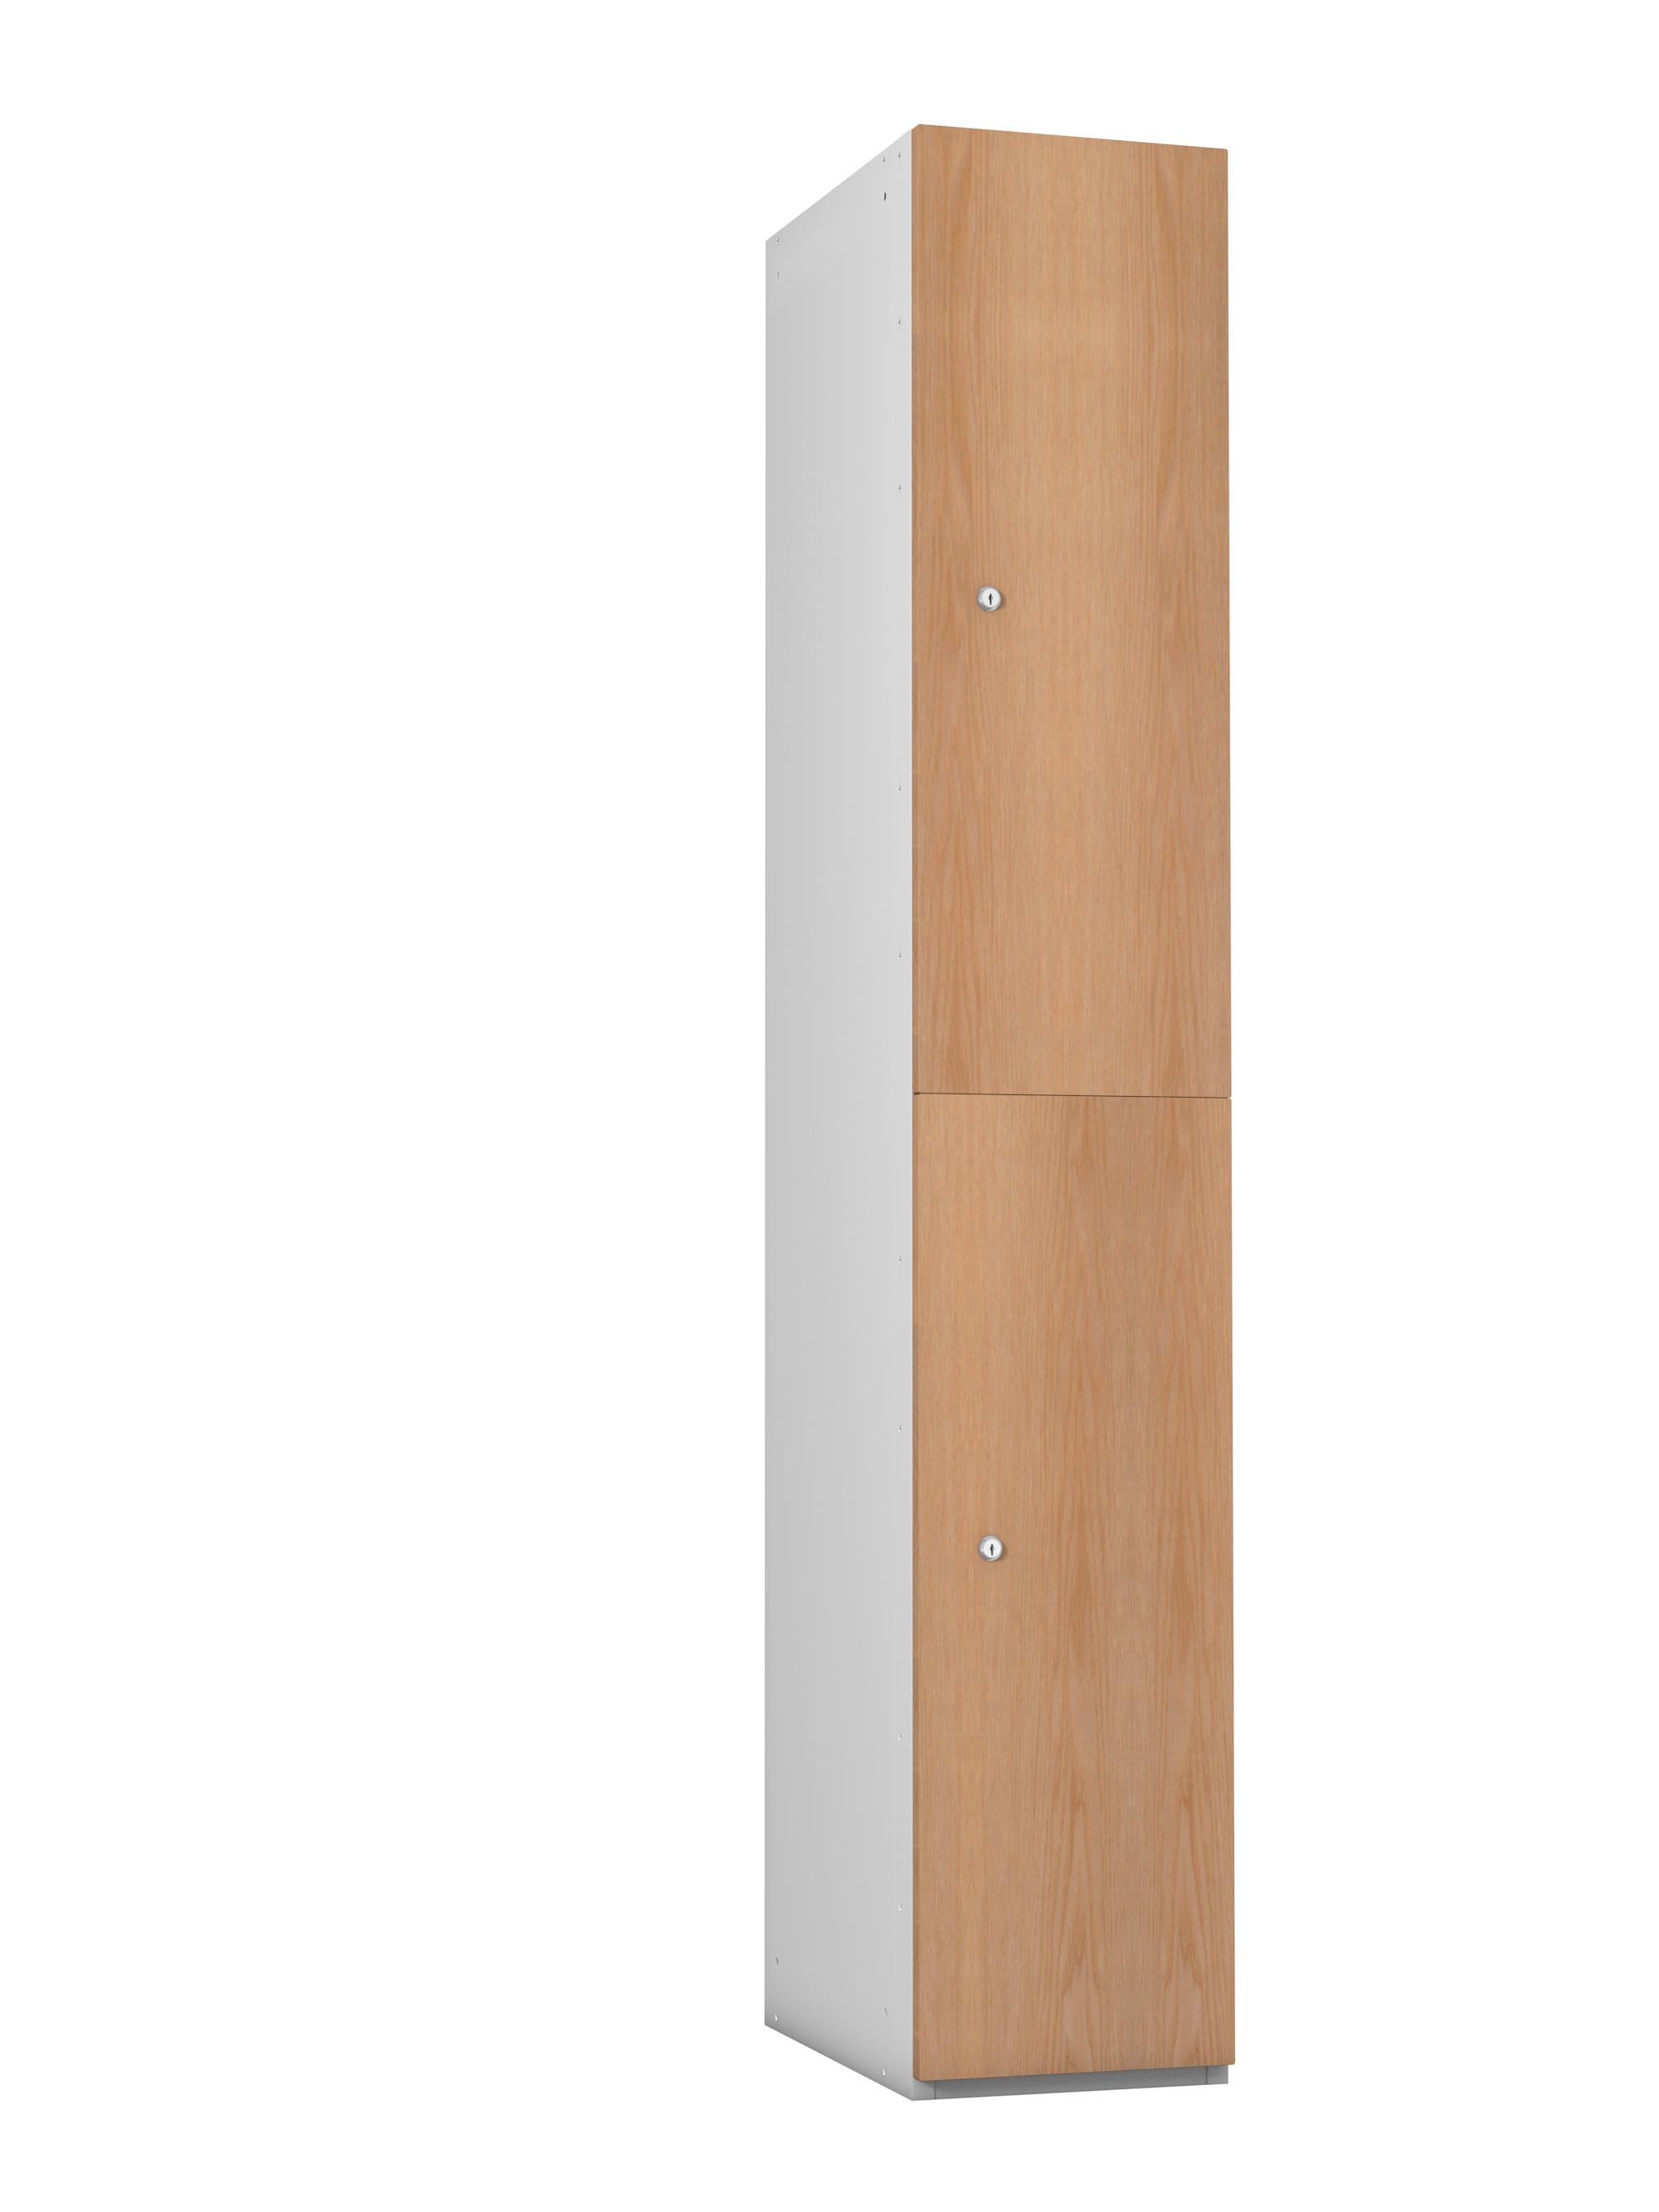 2 Compartment Timber Effect - MFC Door Locker